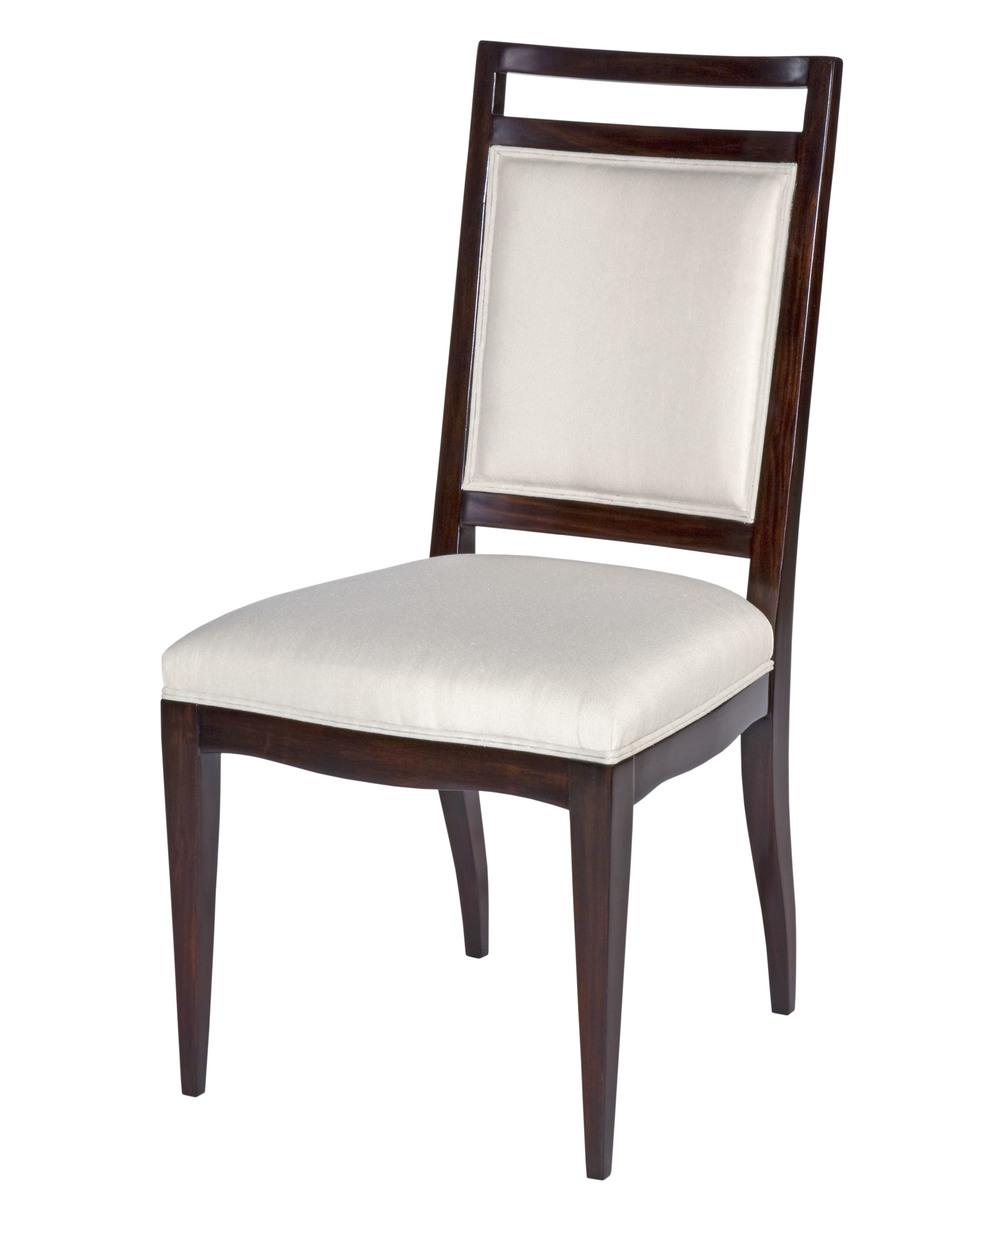 Woodbridge Furniture Company - Addison Upholstered Side Chair